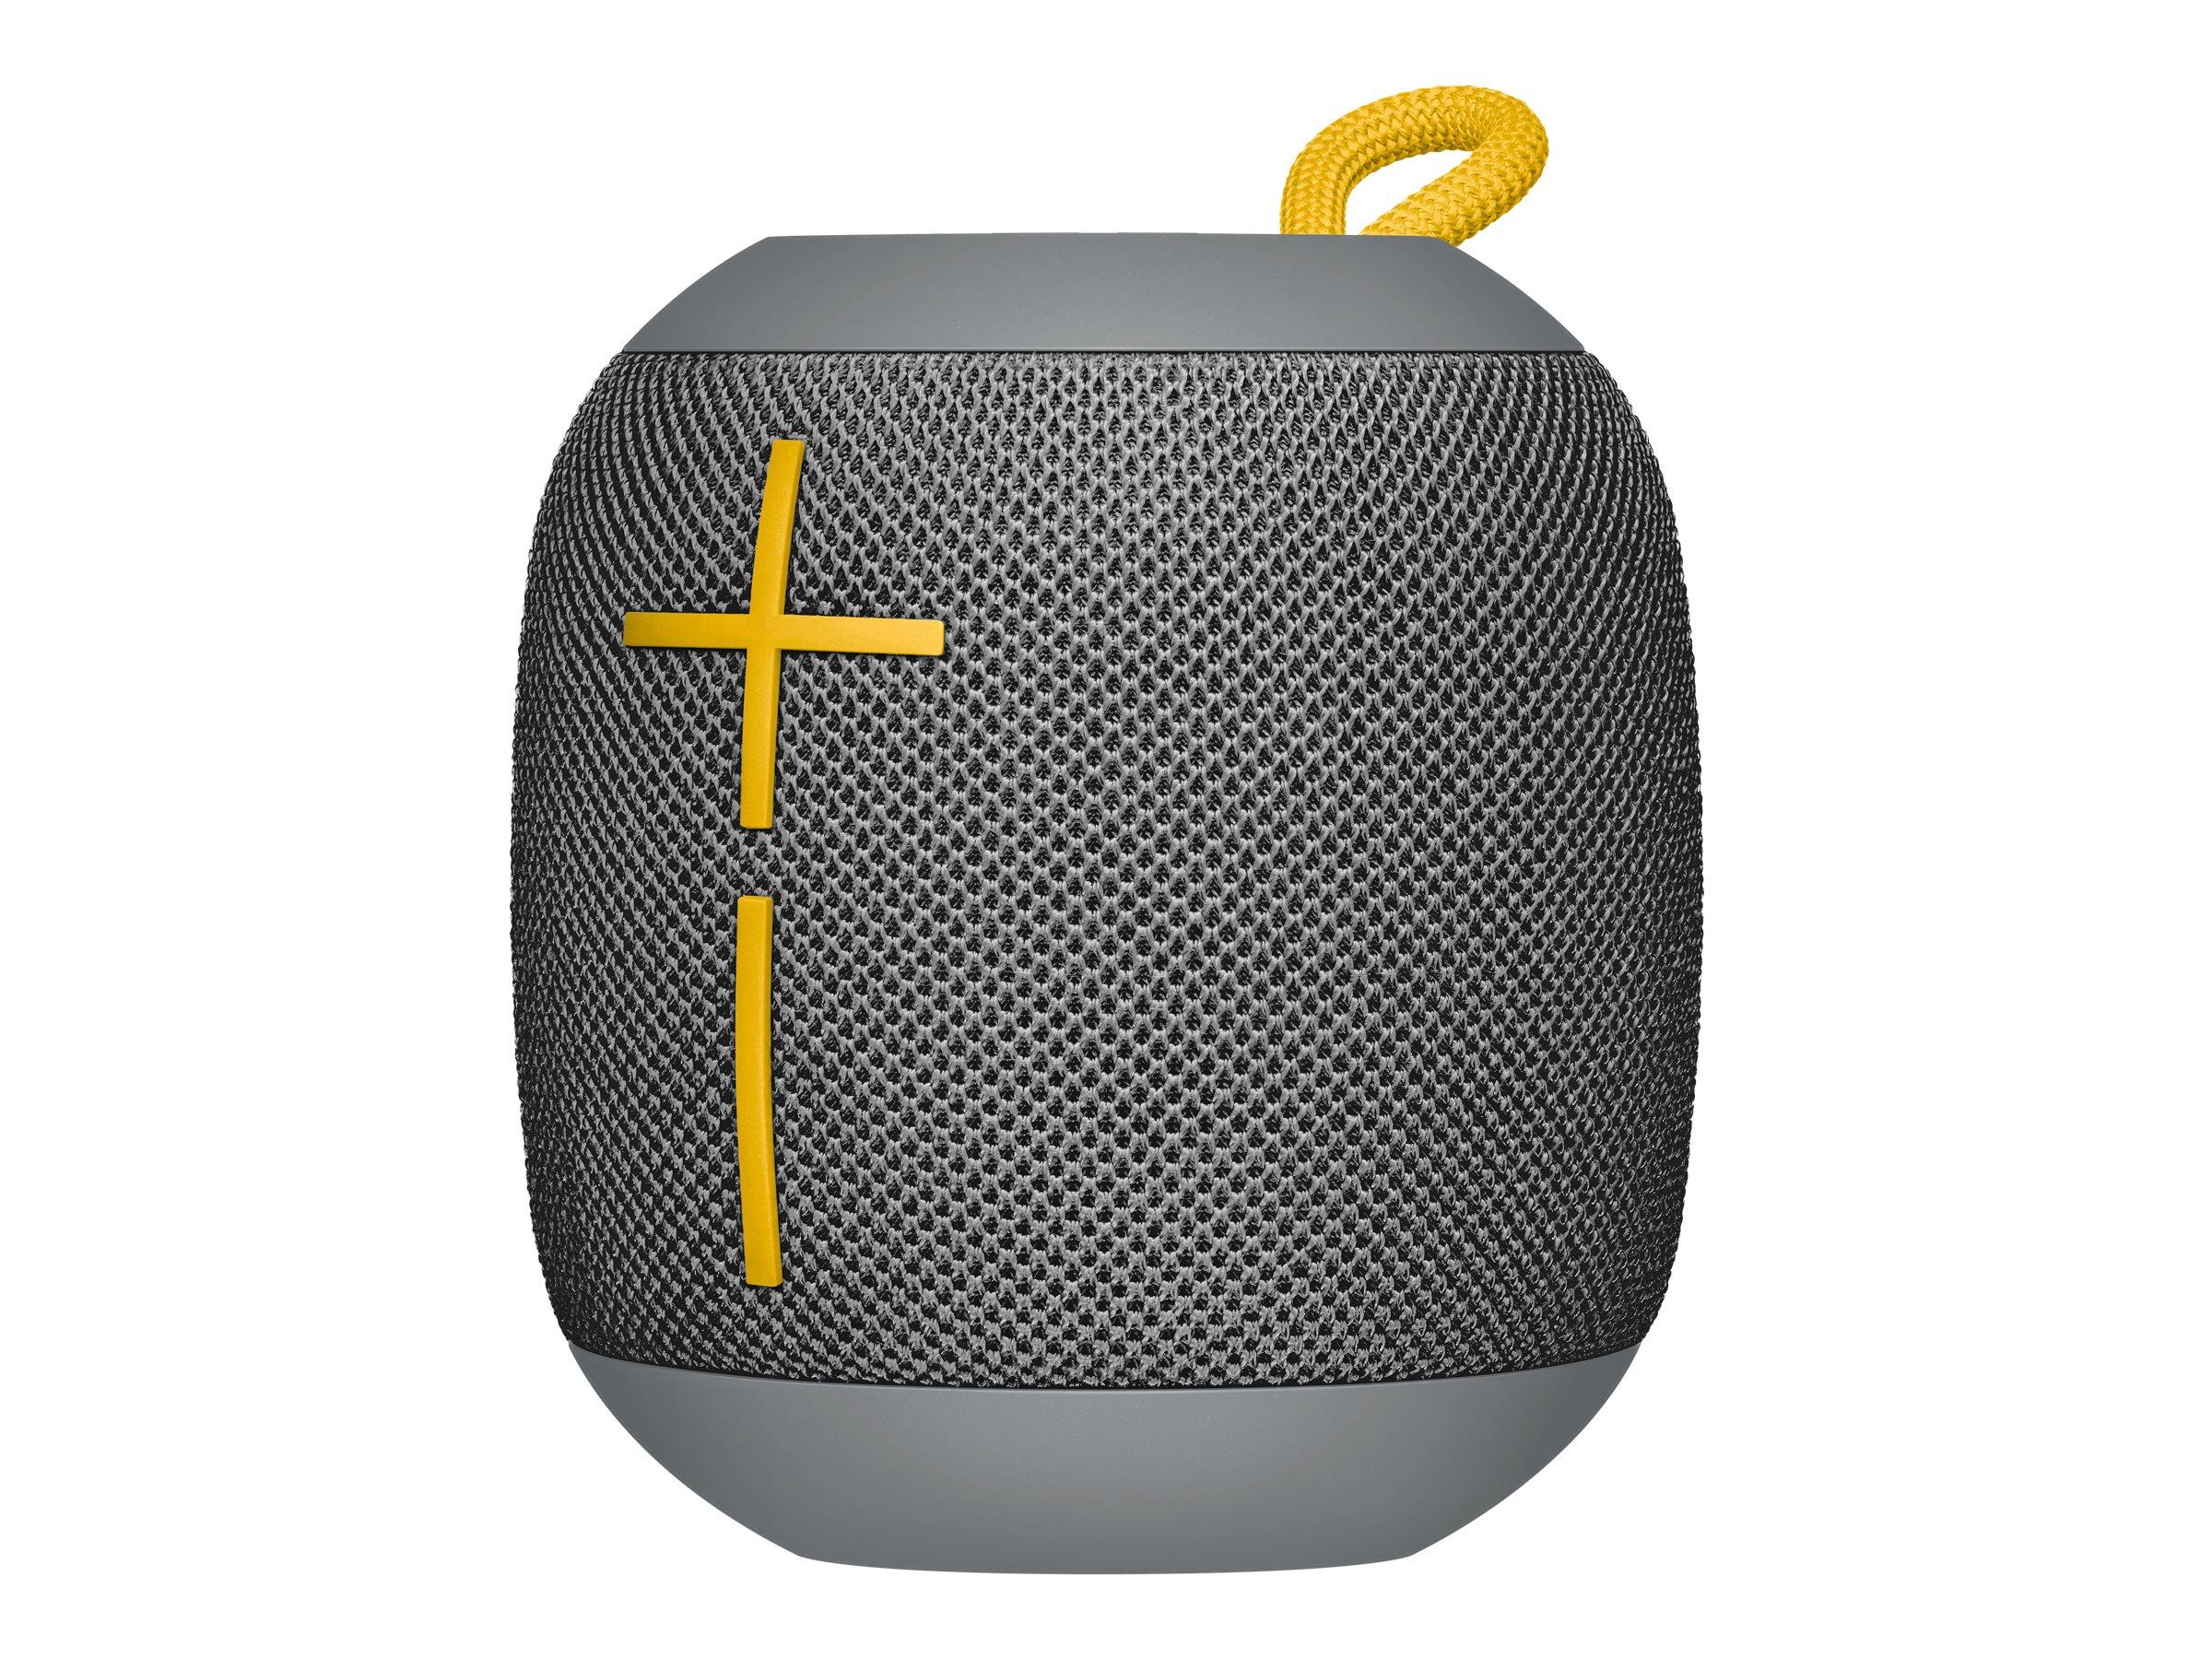 Ultimate Ears WONDERBOOM - Lautsprecher - tragbar - kabellos - Bluetooth - Stein